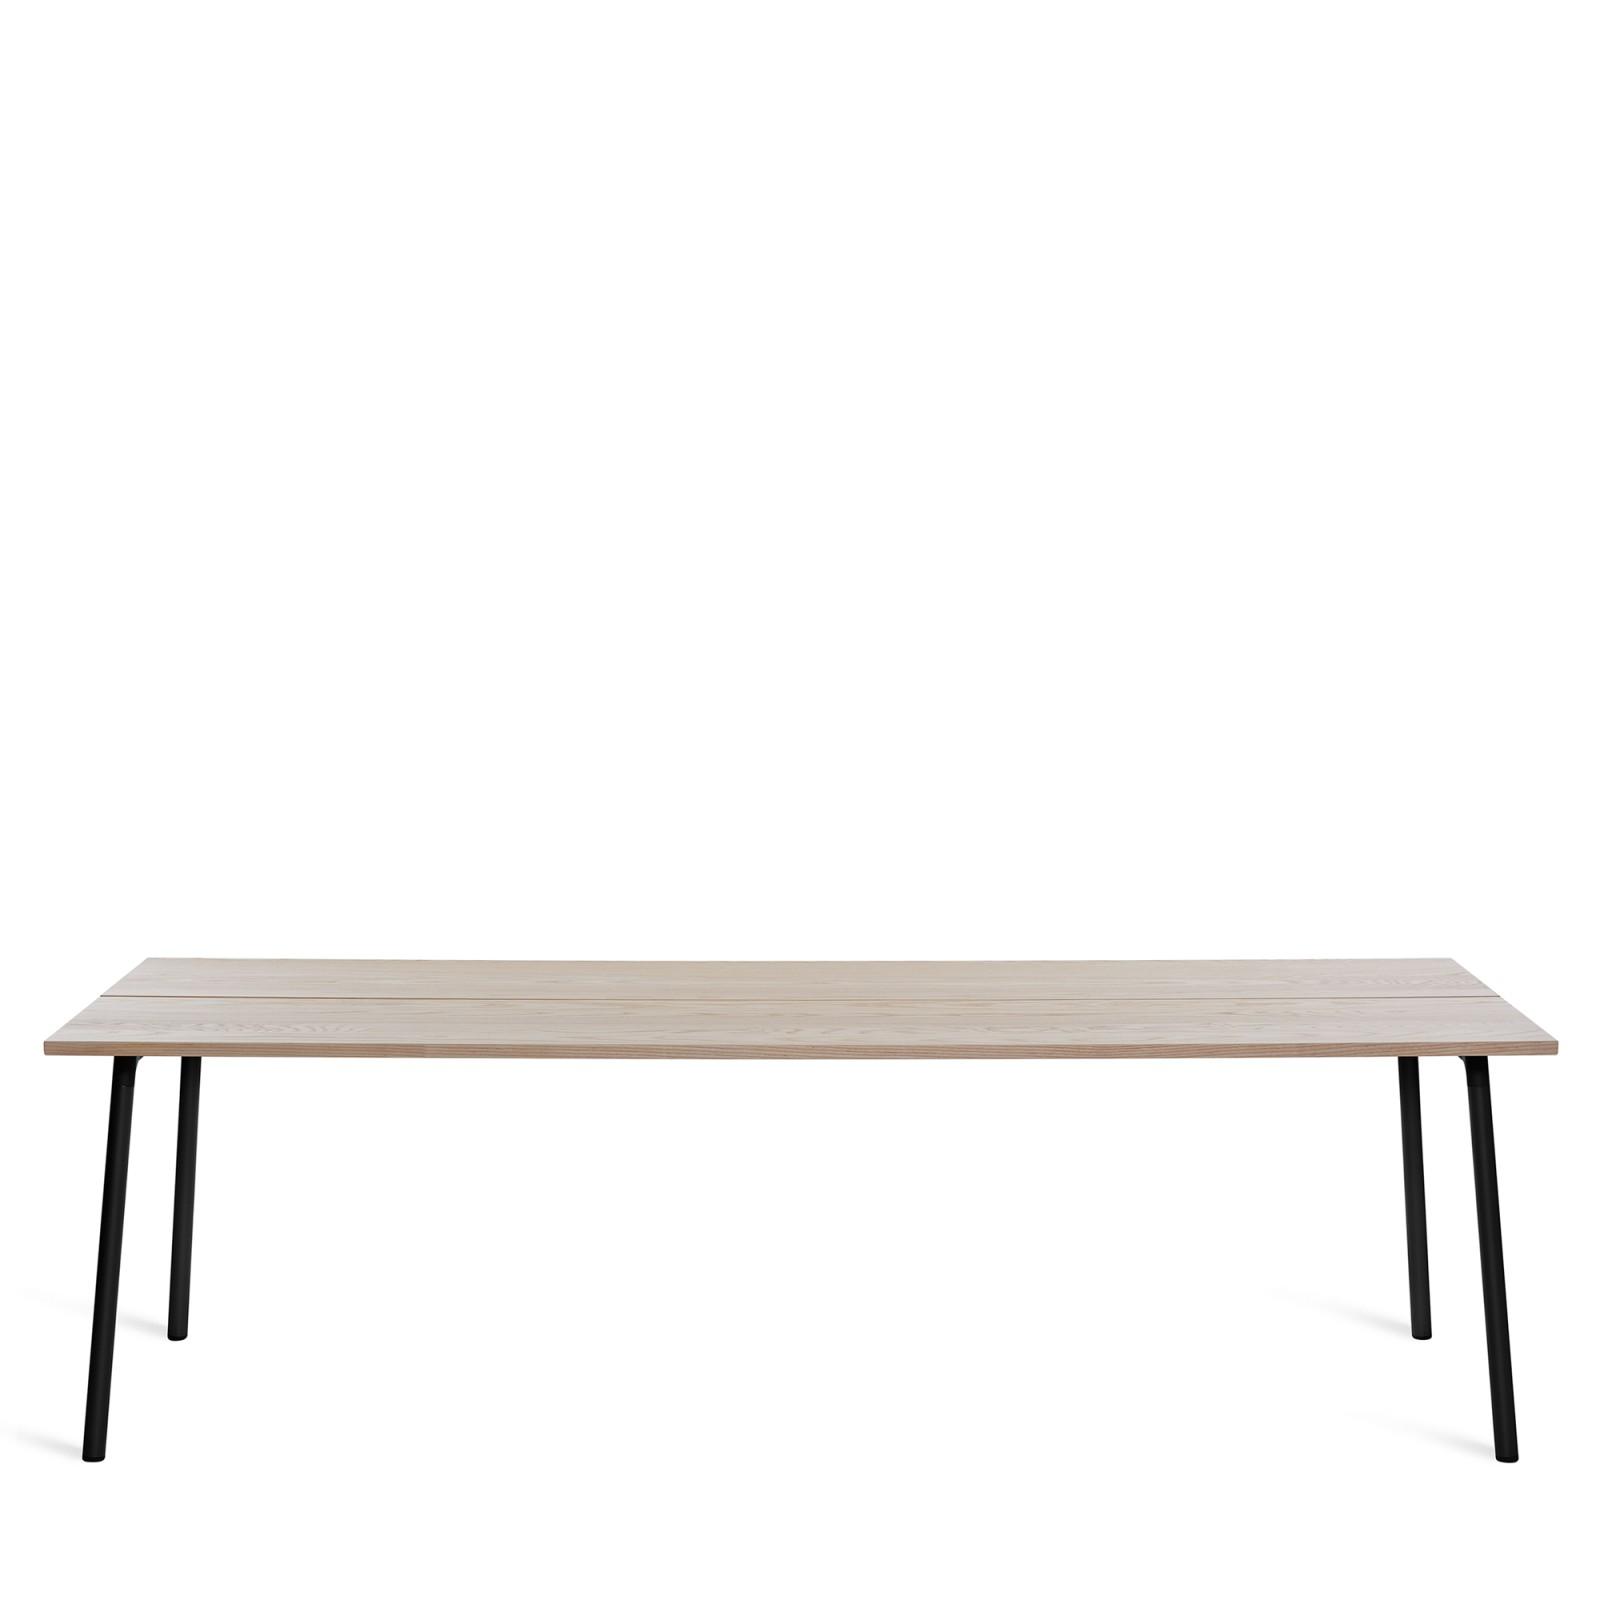 Run Dining Table Rectangular 244cm, Black Powder Coated, Ash